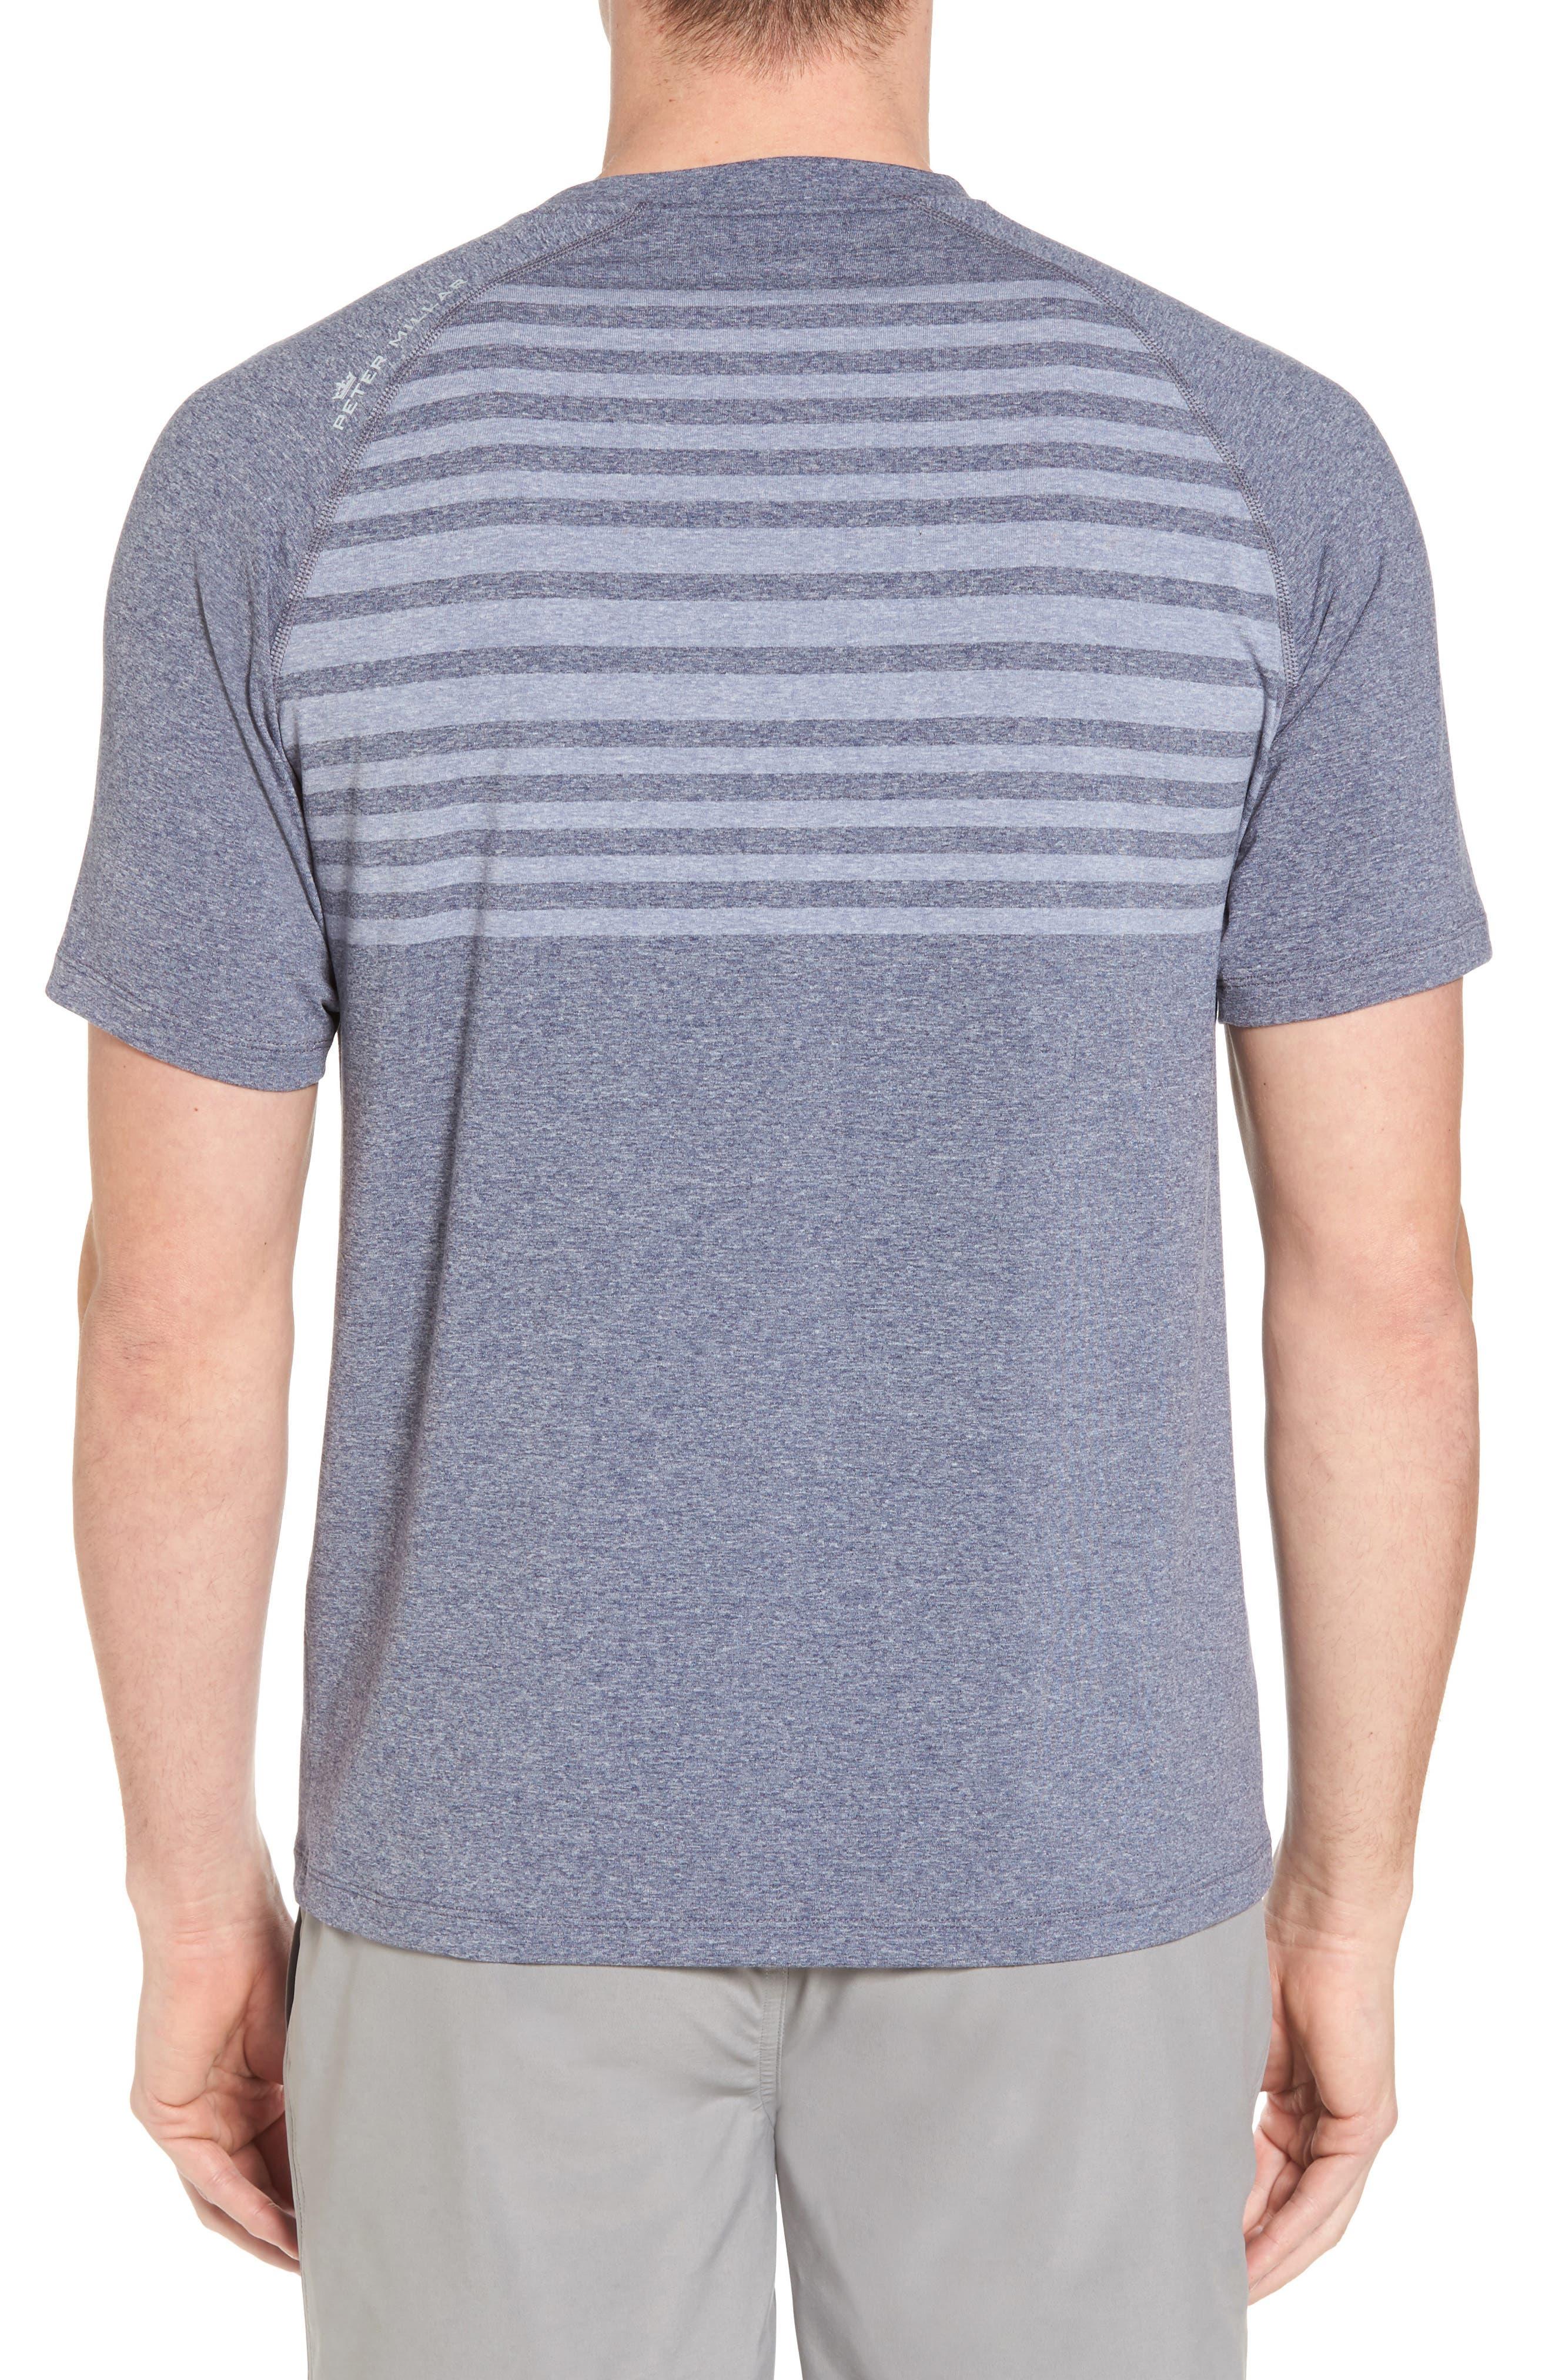 Alternate Image 2  - Peter Millar Rio Stripe Technical T-Shirt